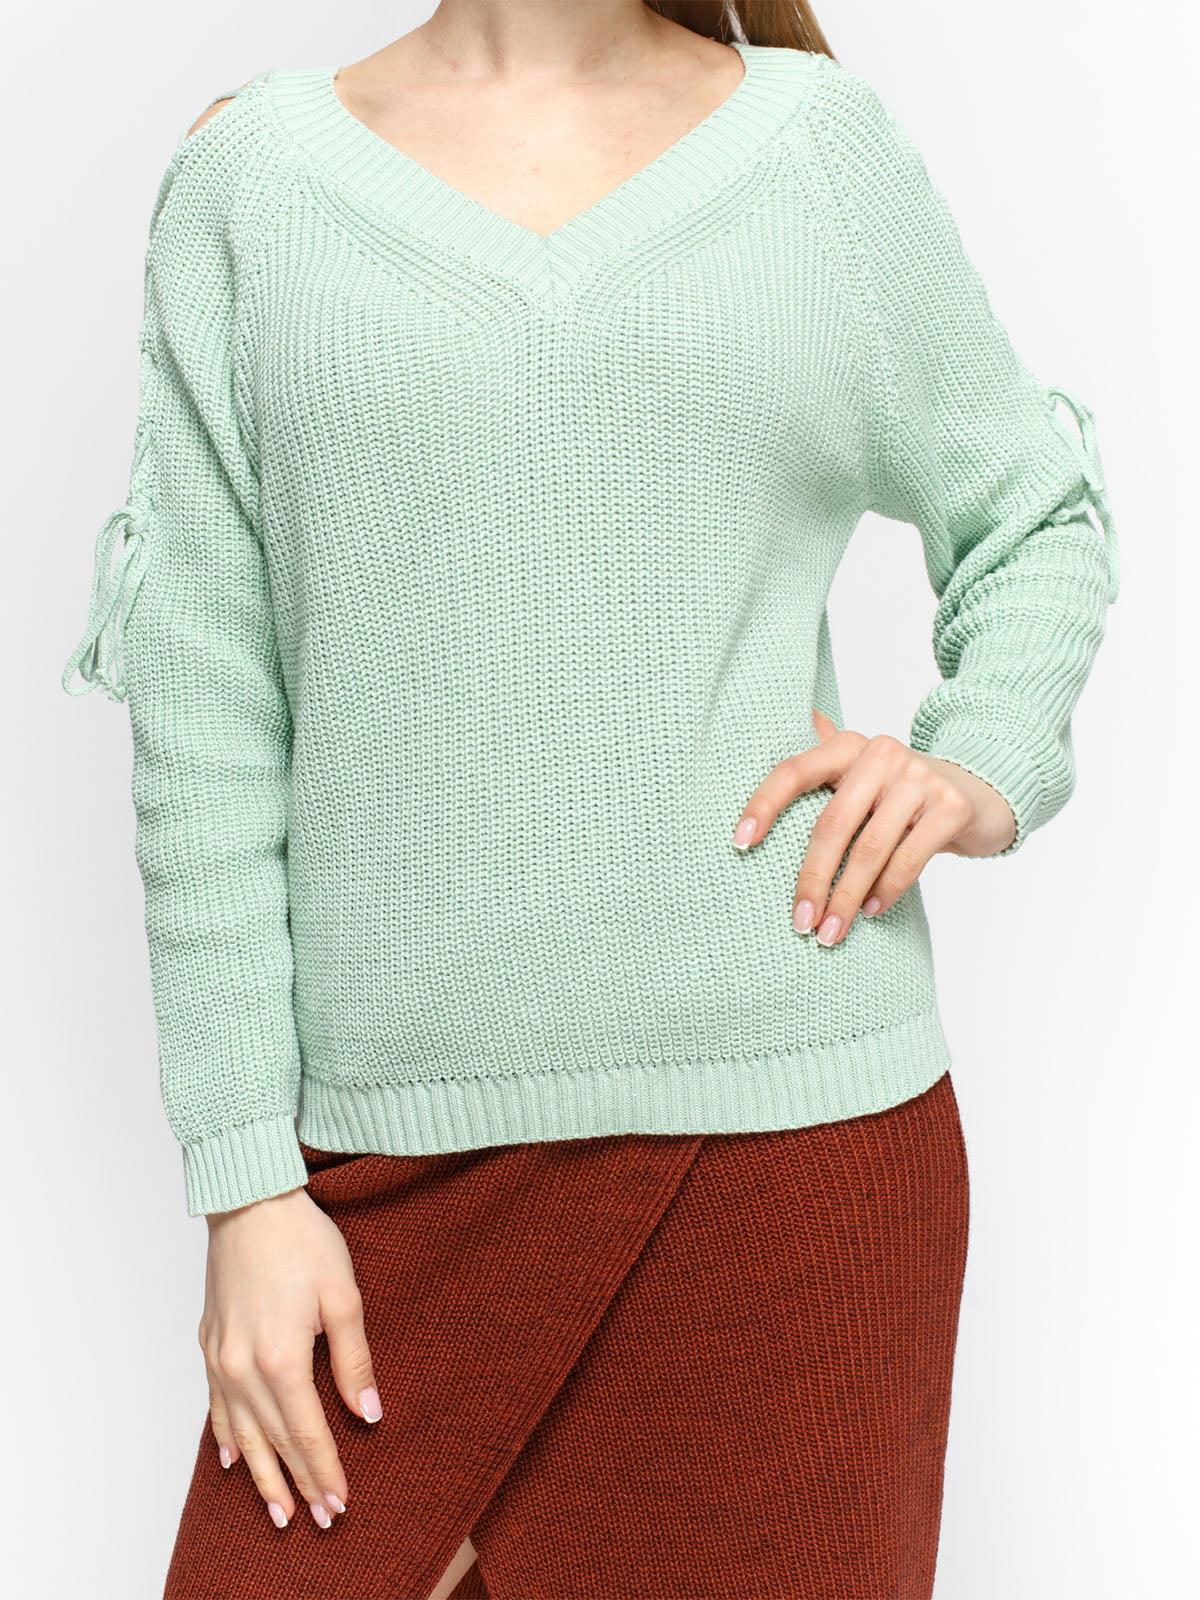 Пуловер м'ятного кольору | 4885875 | фото 3